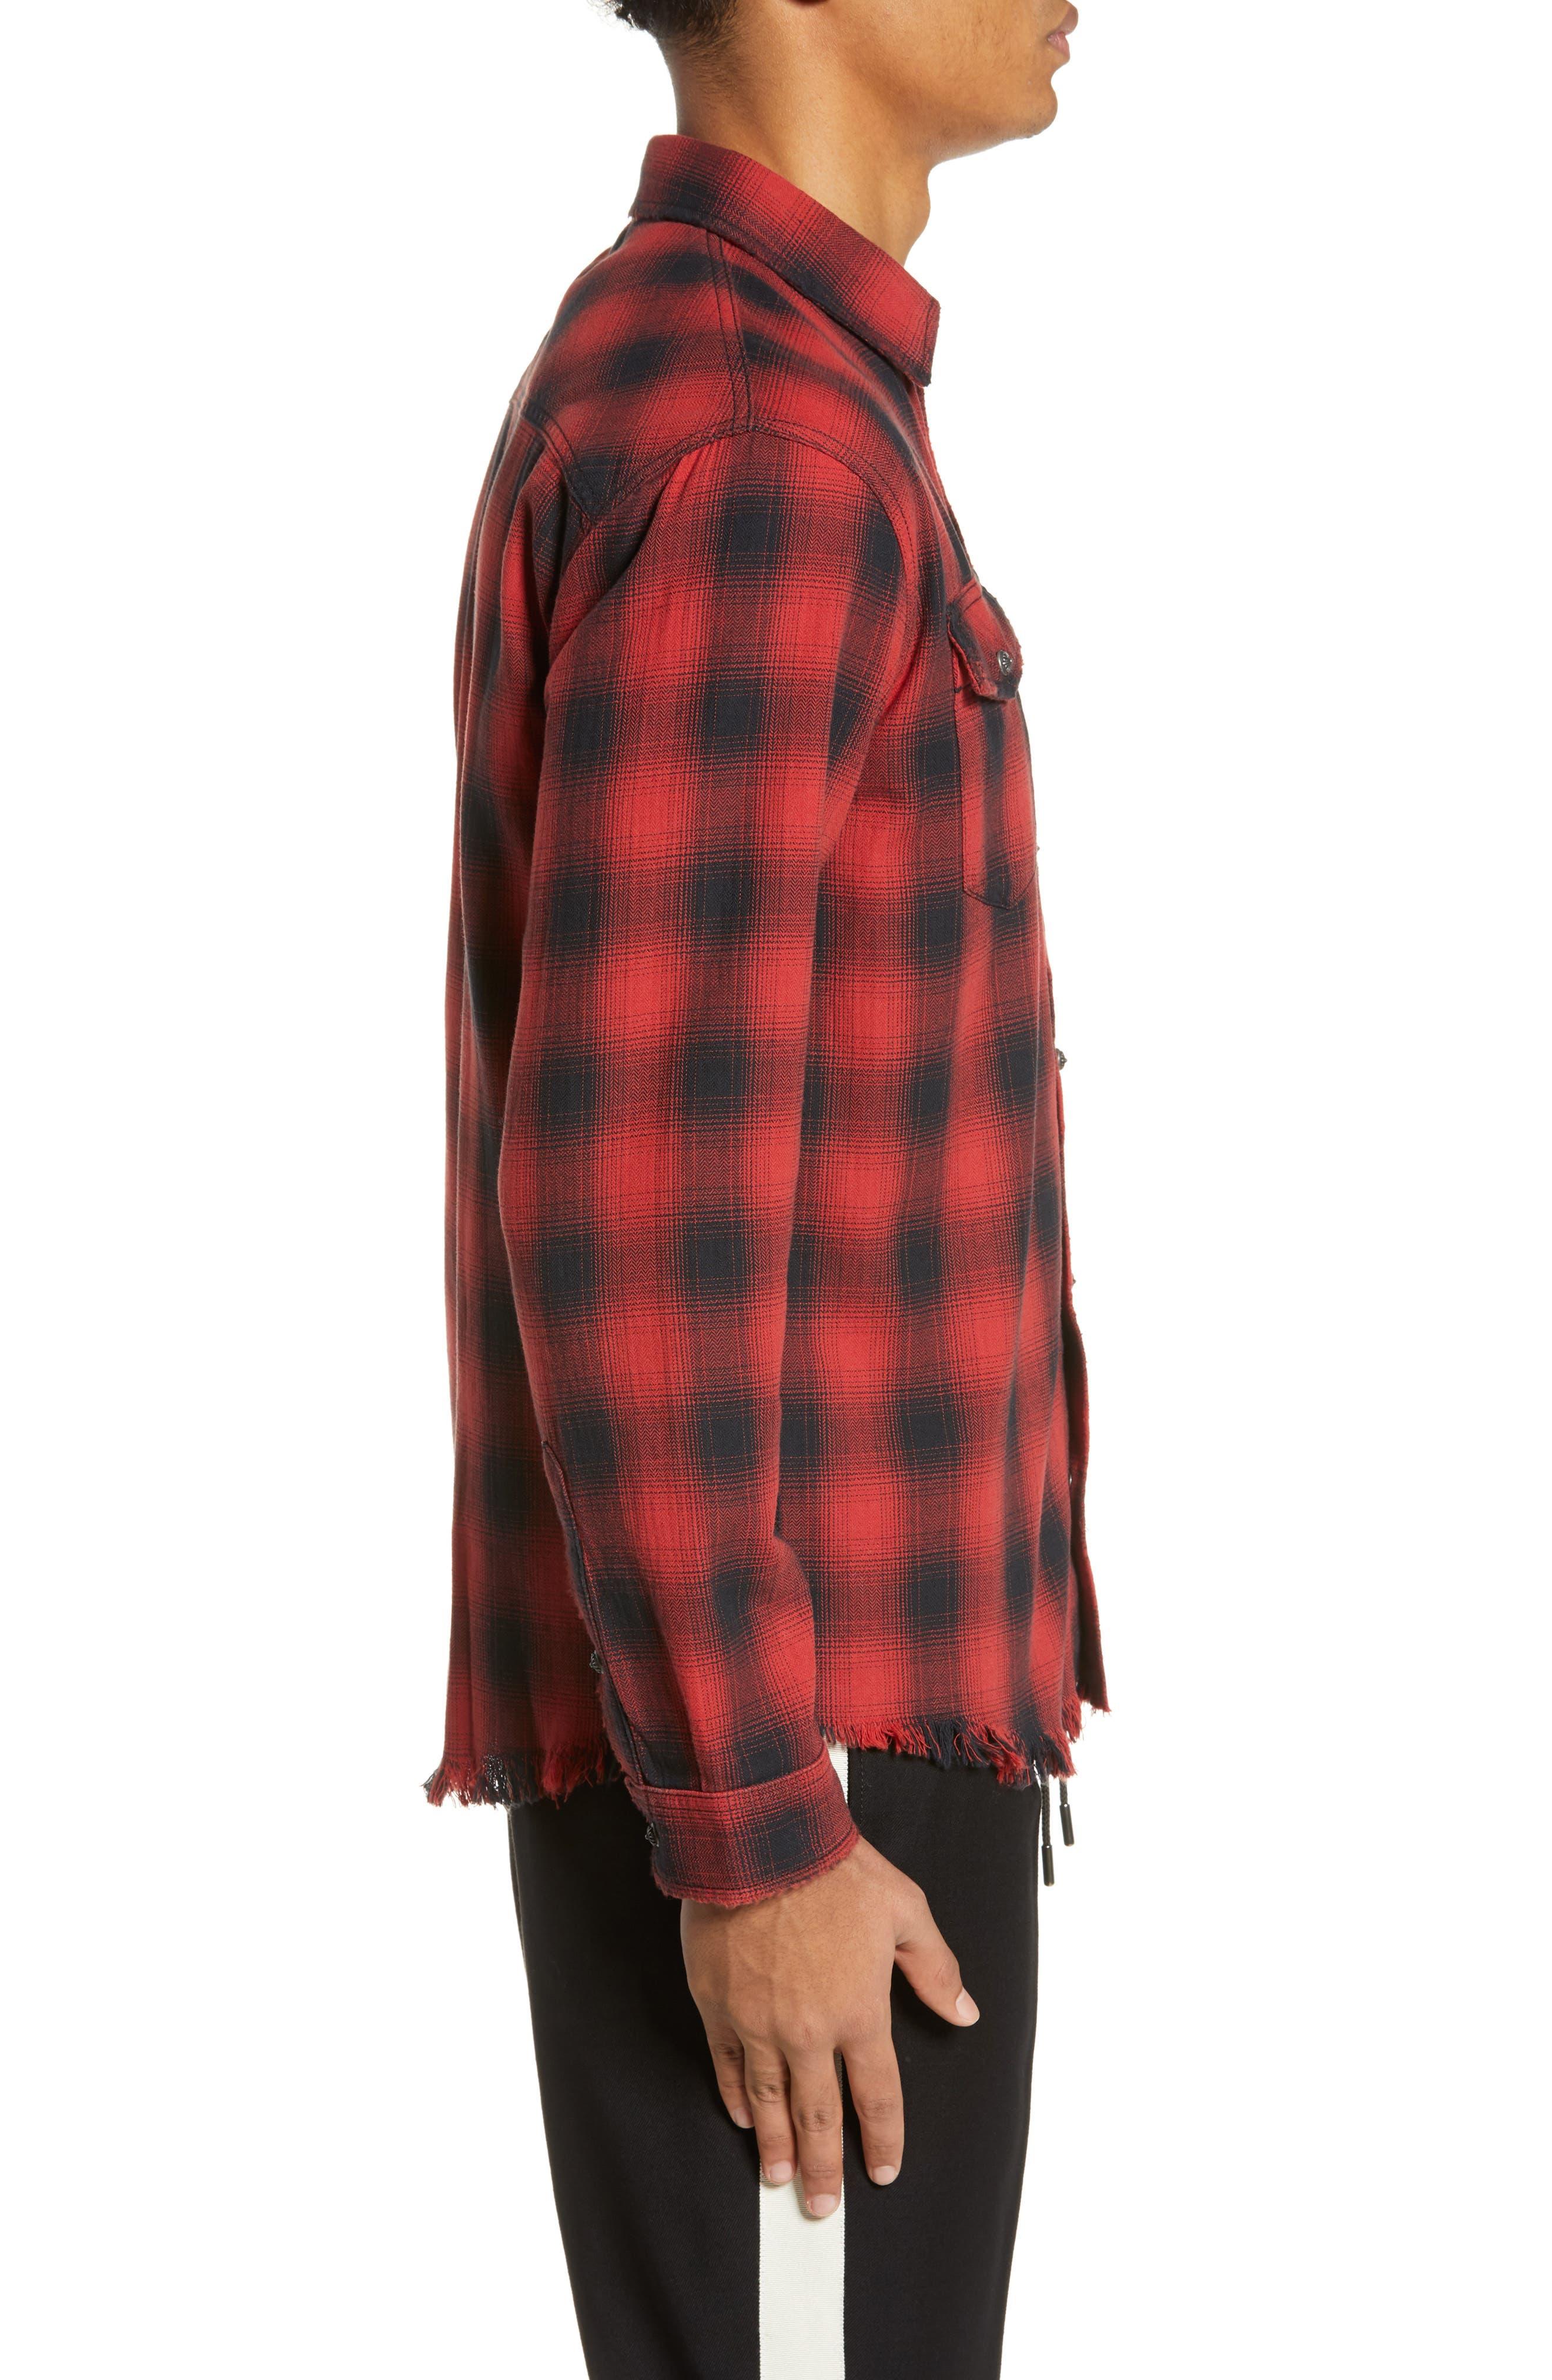 THE KOOPLES, Regular Fit Ombré Plaid Shirt, Alternate thumbnail 4, color, RED / BLACK